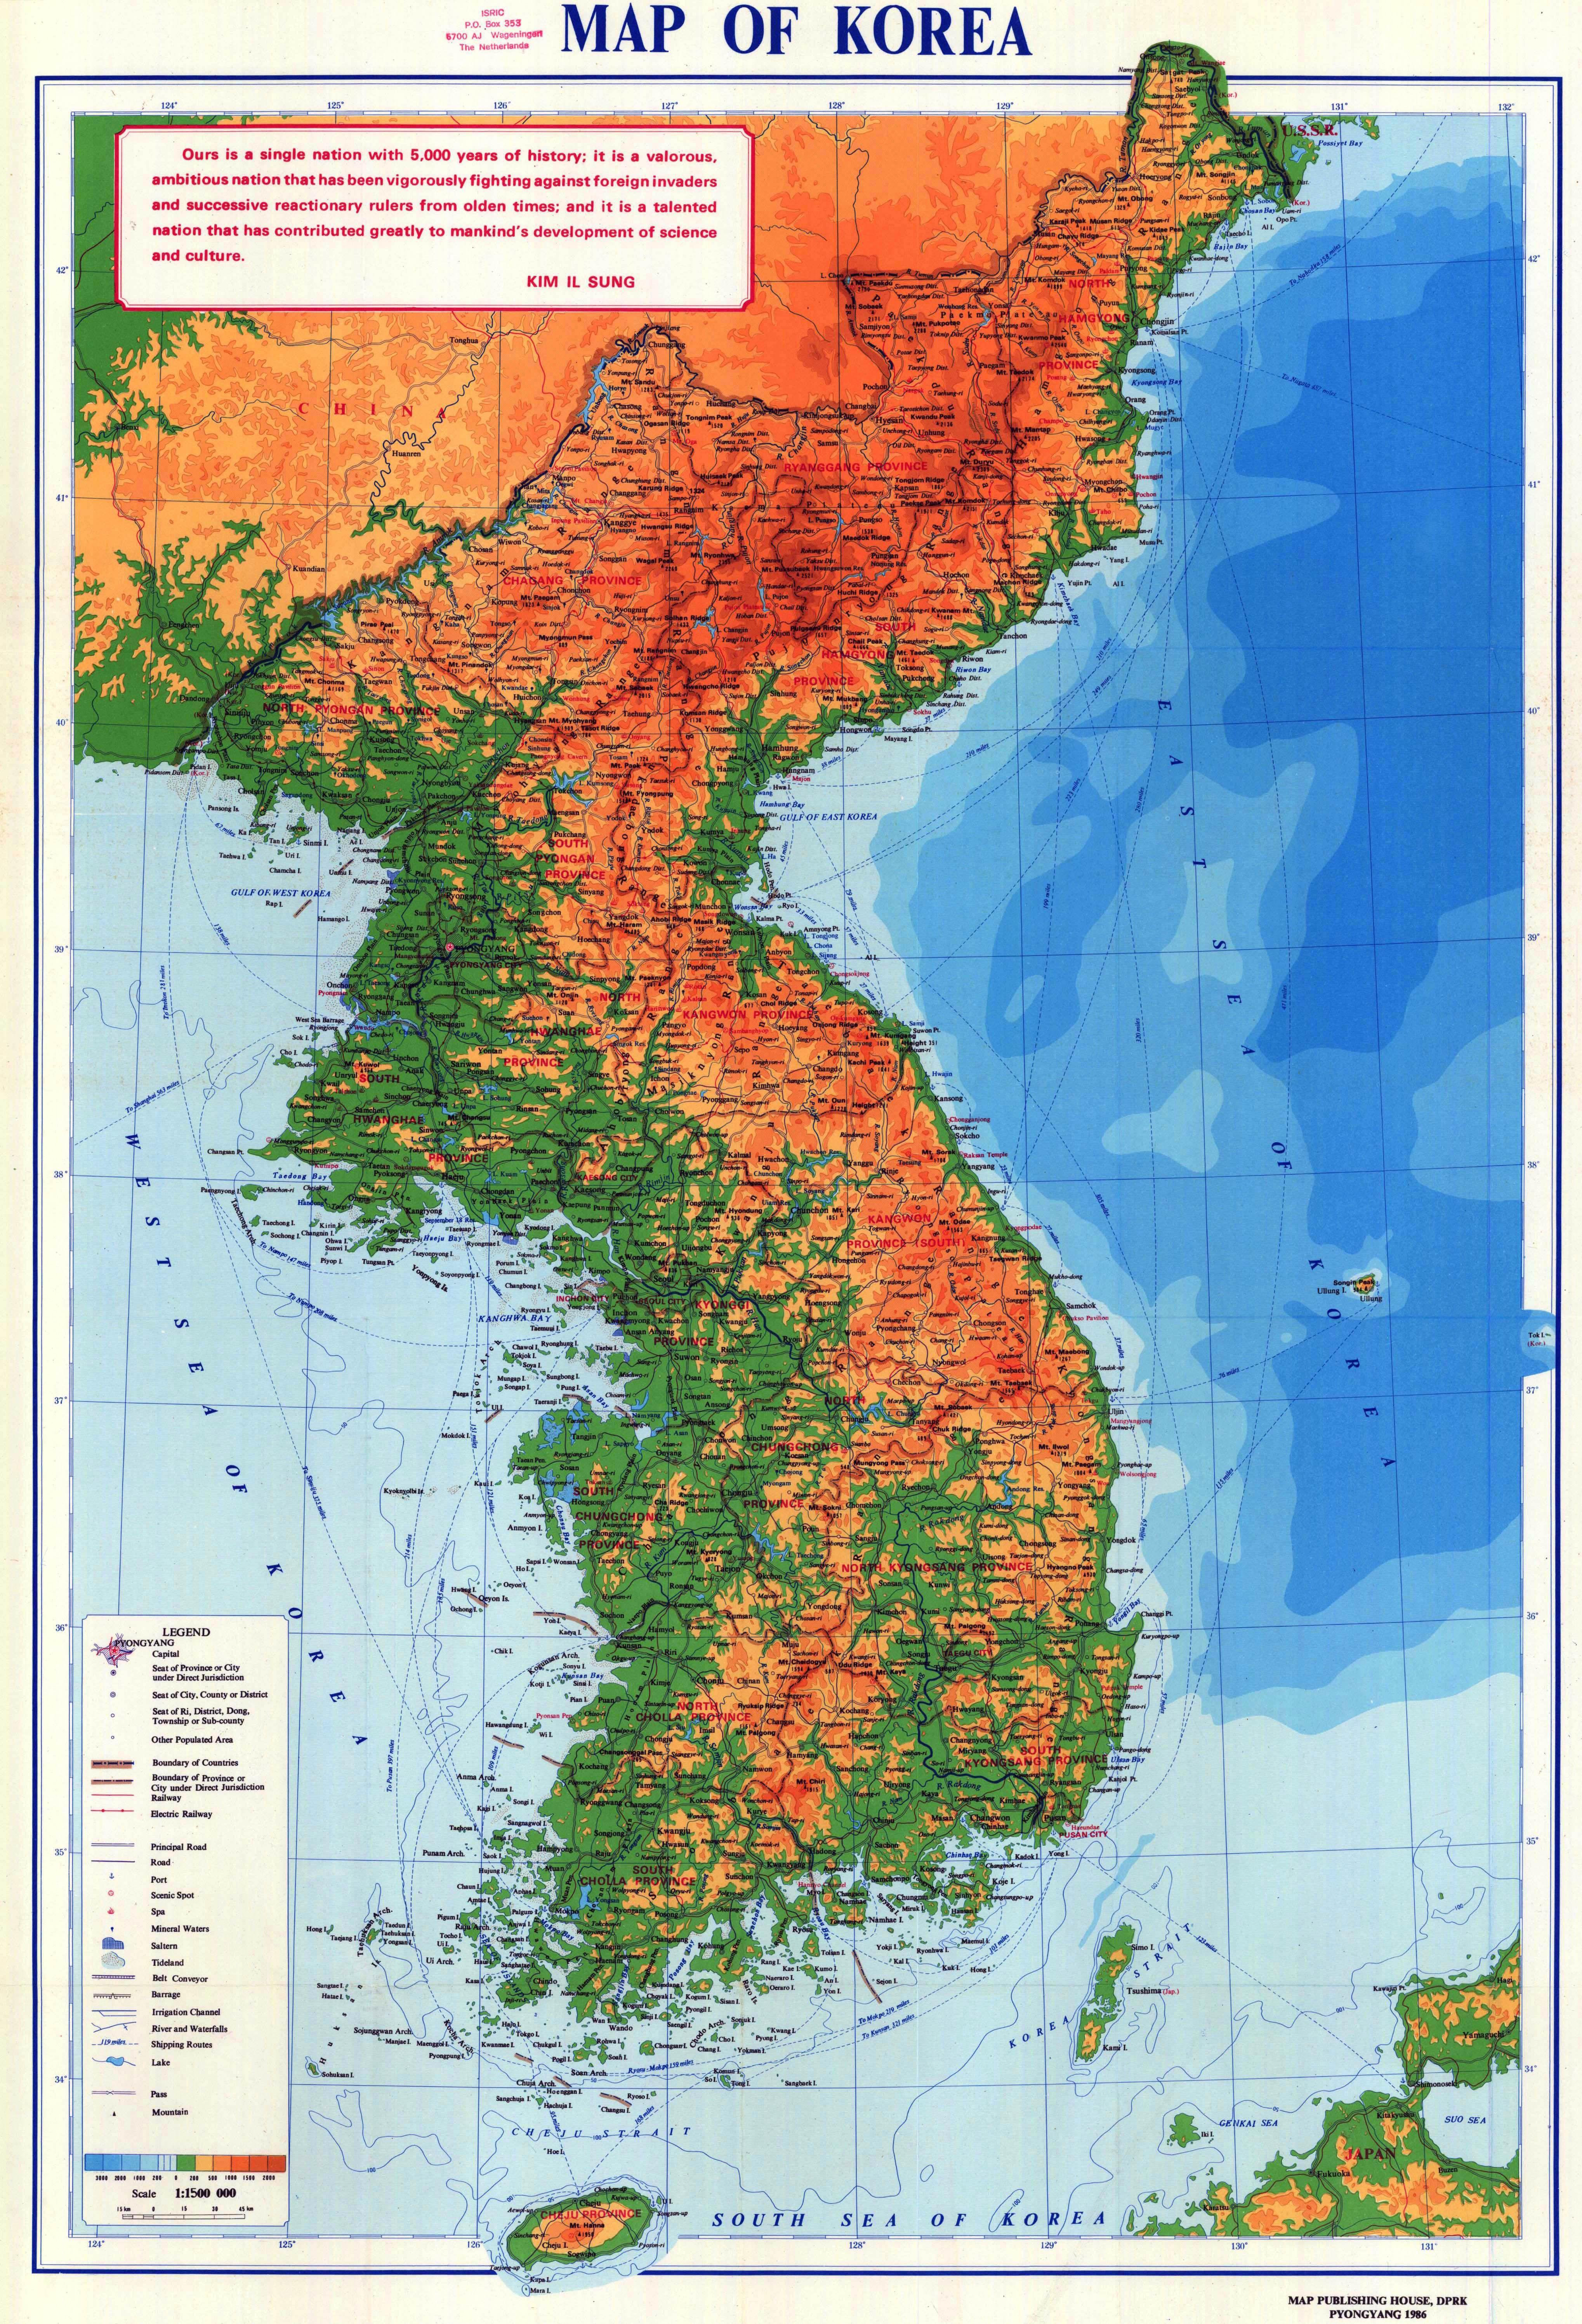 Korean Peninsula: description, attractions and interesting facts 24